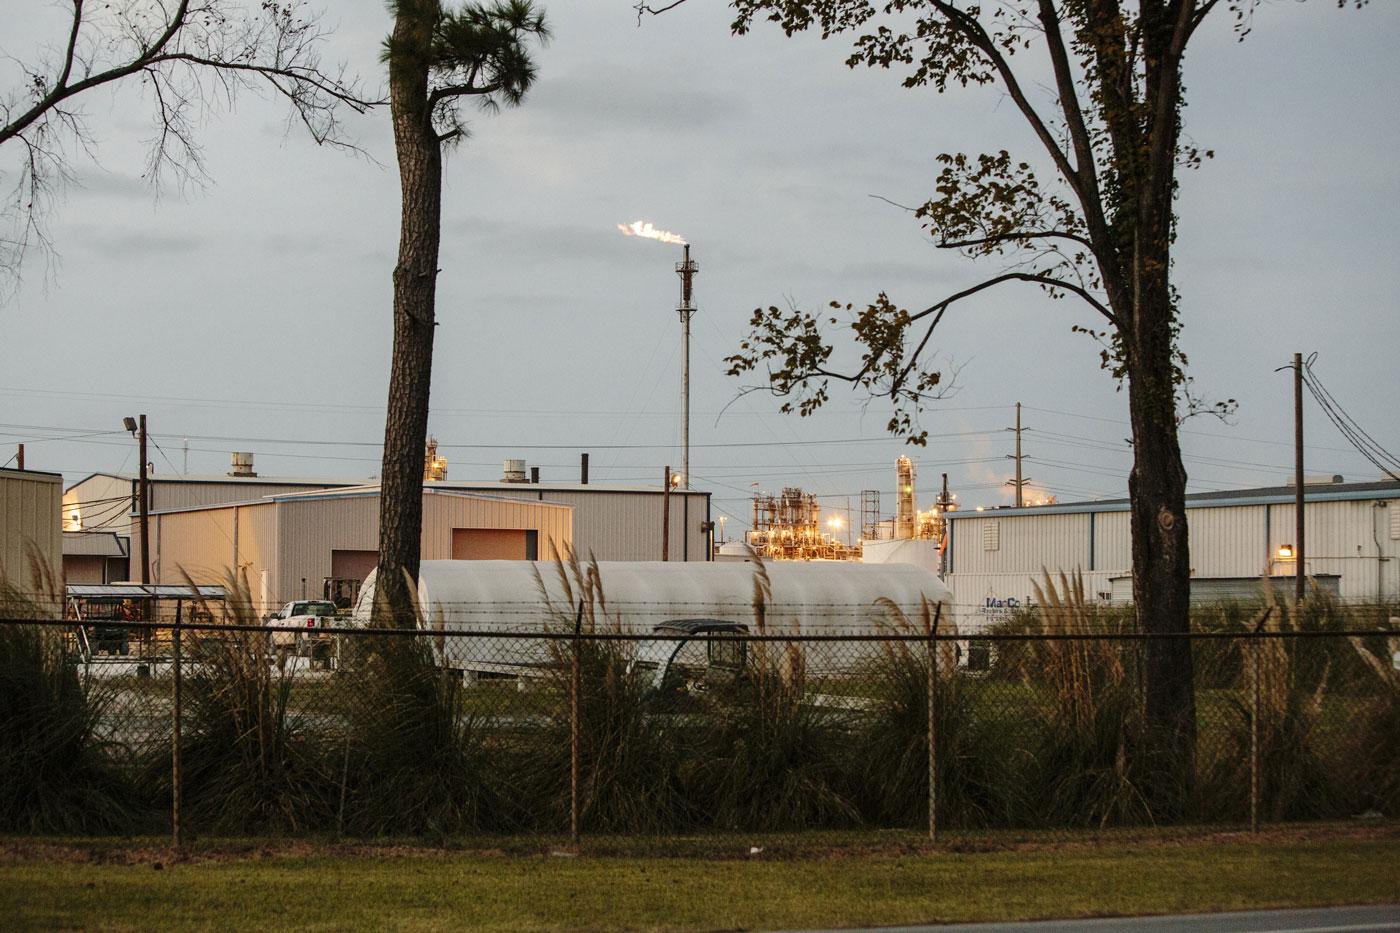 A gas flare inside the Sasol plant, Oct. 22, 2015, Westlake, La.